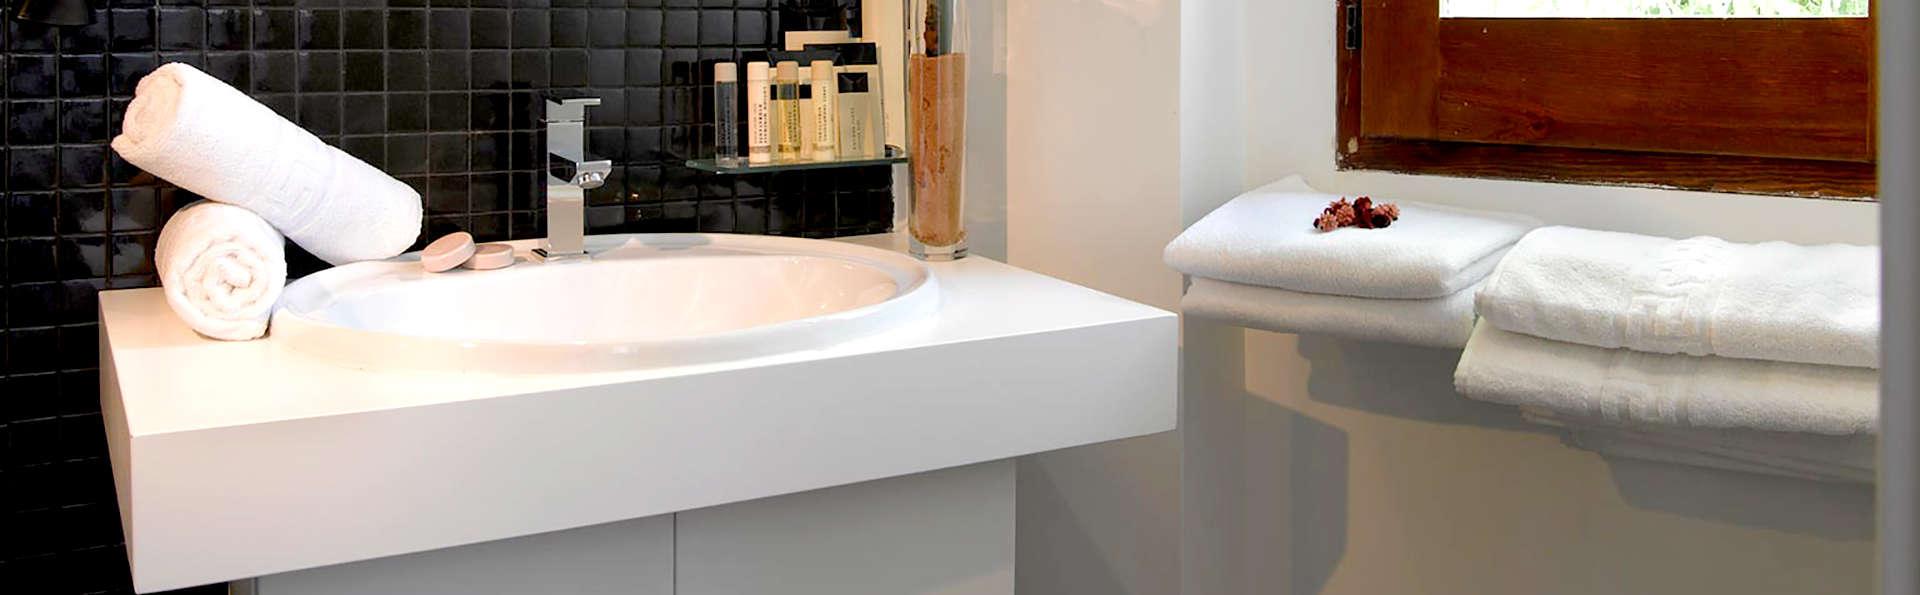 Marquis Hotels Portago - Edit_Bathroom3.jpg